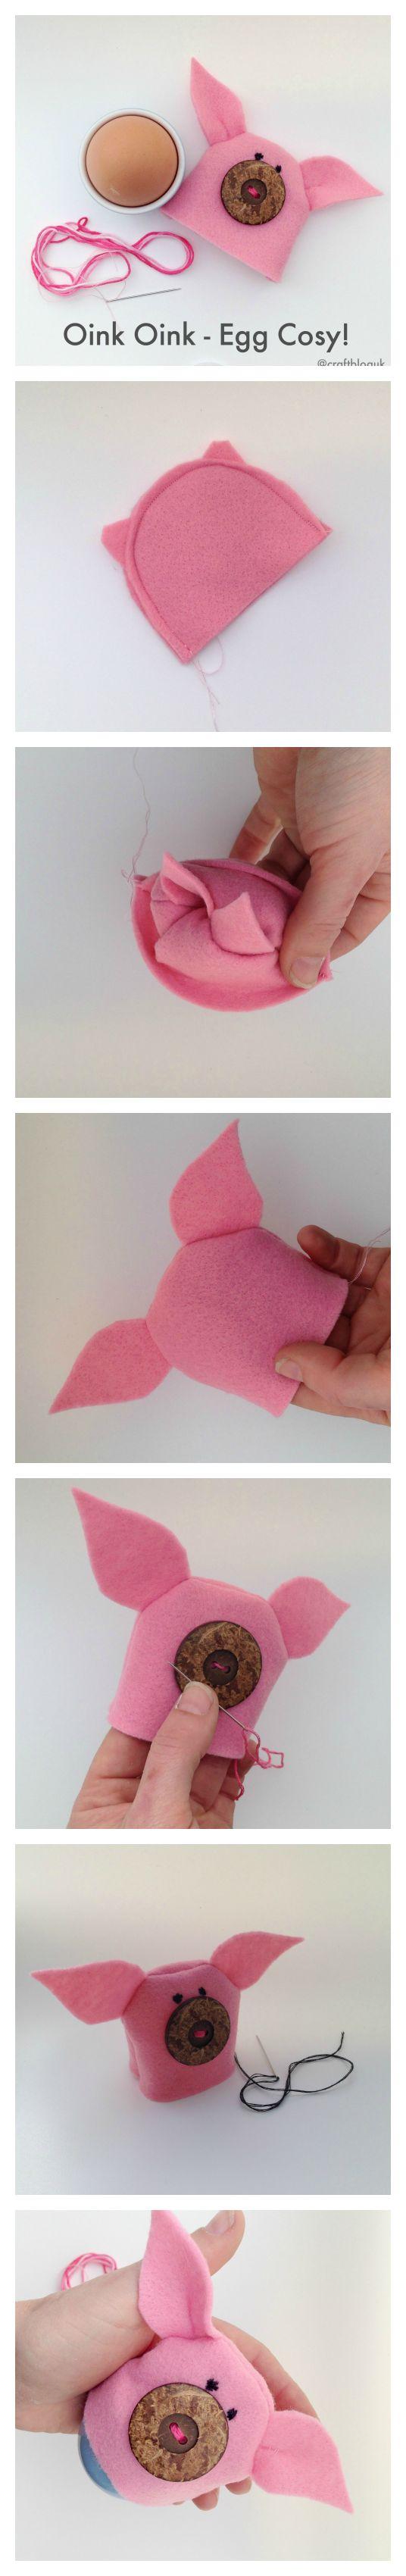 Make a cute little pig egg cosy out of felt!